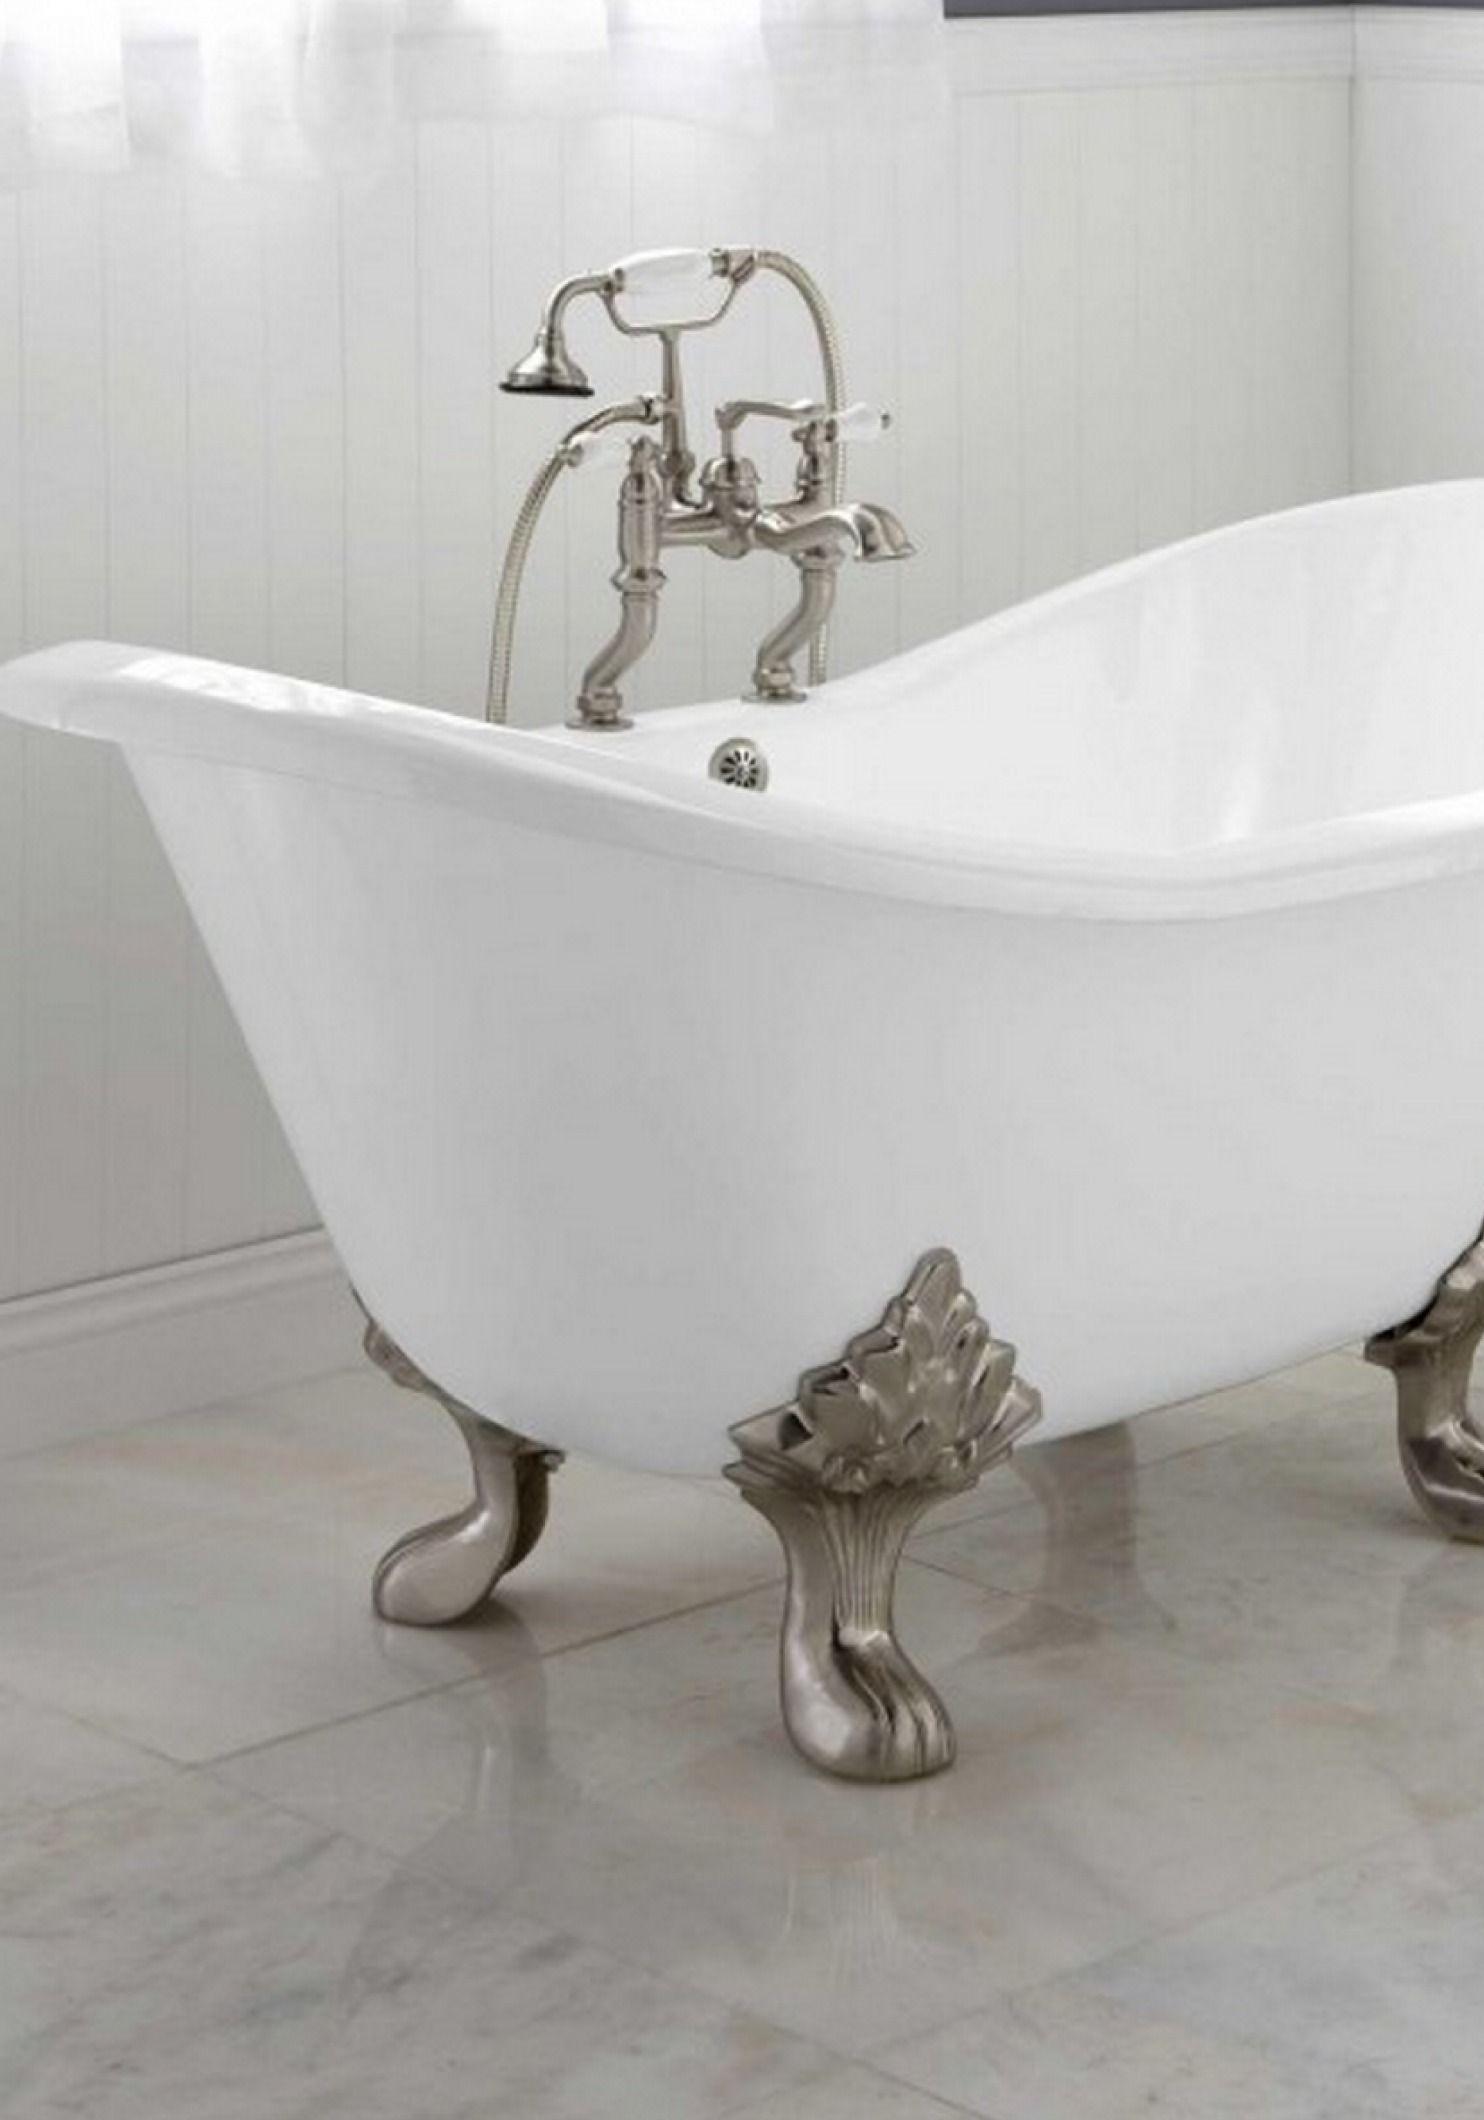 Arabella Cast Iron Double-Slipper Tub | Tubs, Master bathrooms and Iron